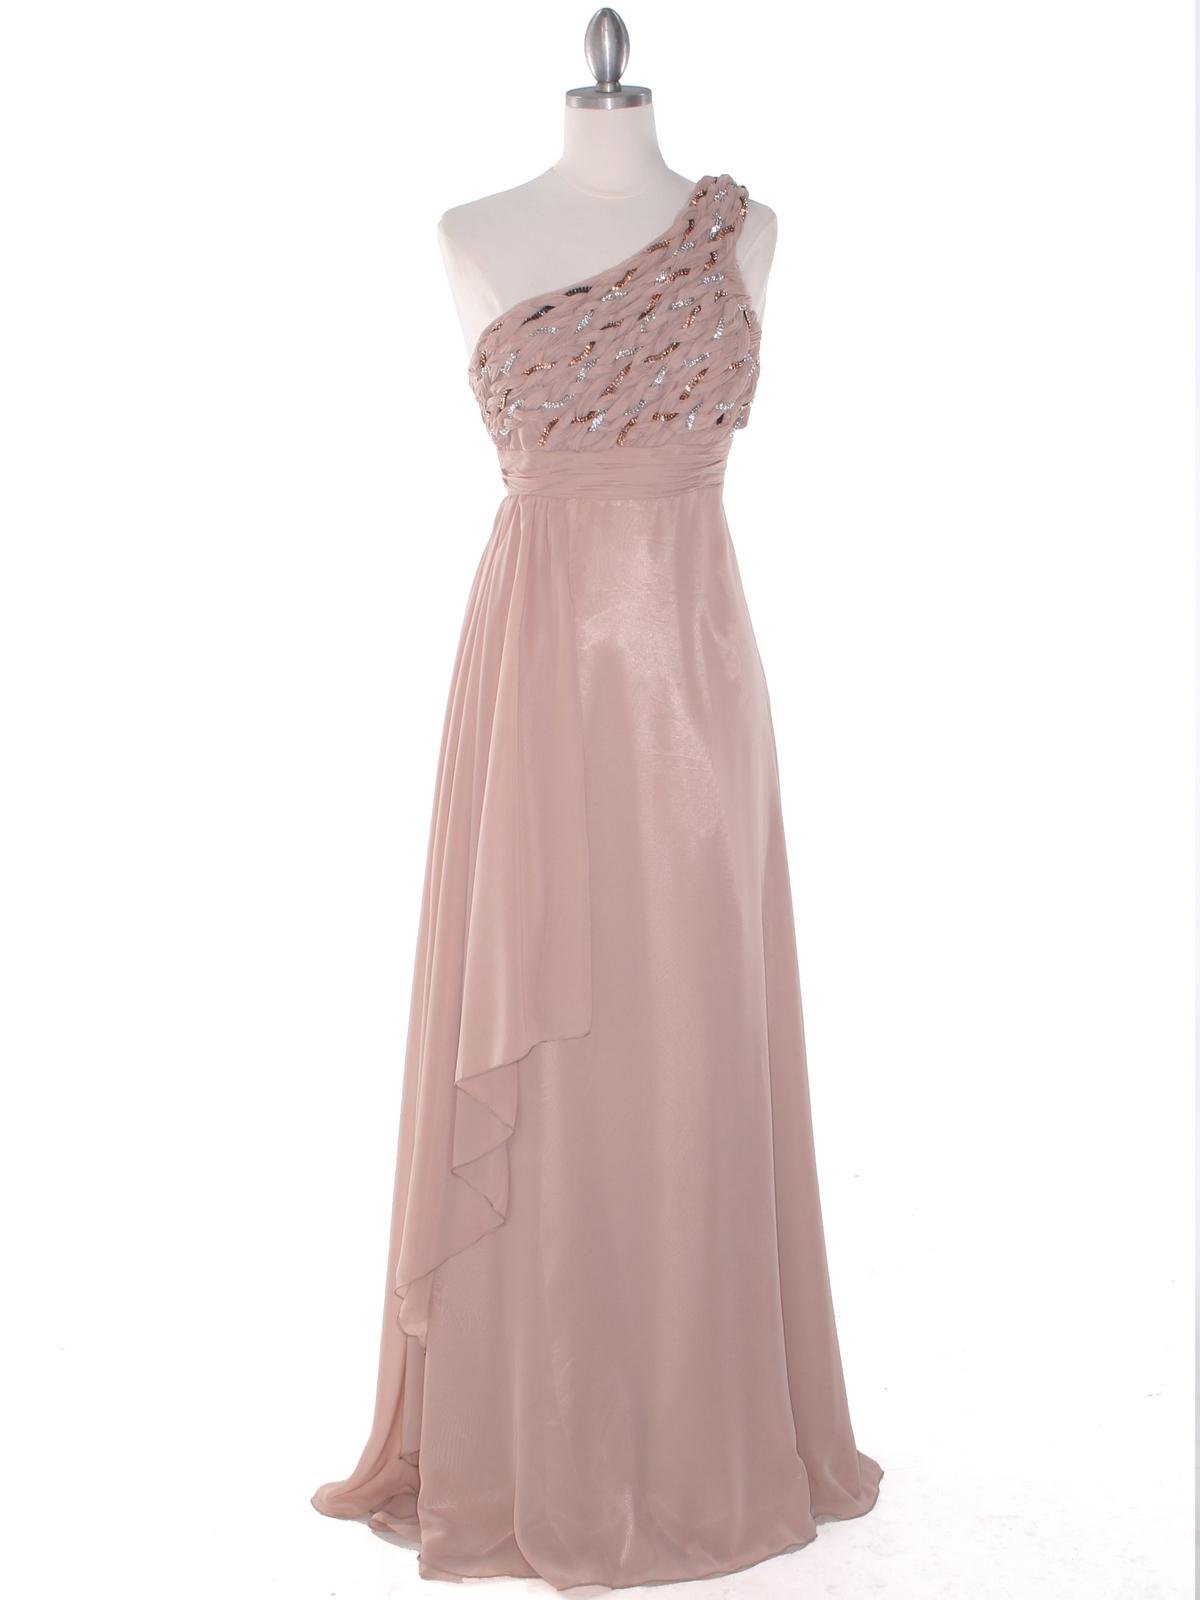 Rhinestone Braided Bodice Empire Waist Evening Dress